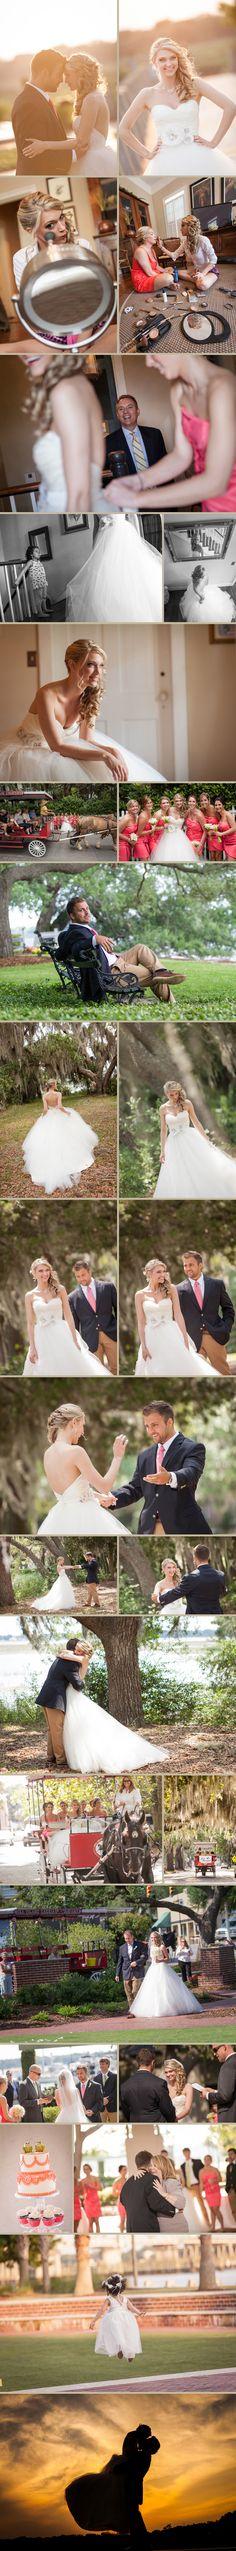 Charleston Wedding Photographer Richard Ellis » Charleston & Lowcountry Wedding Photography » page 5